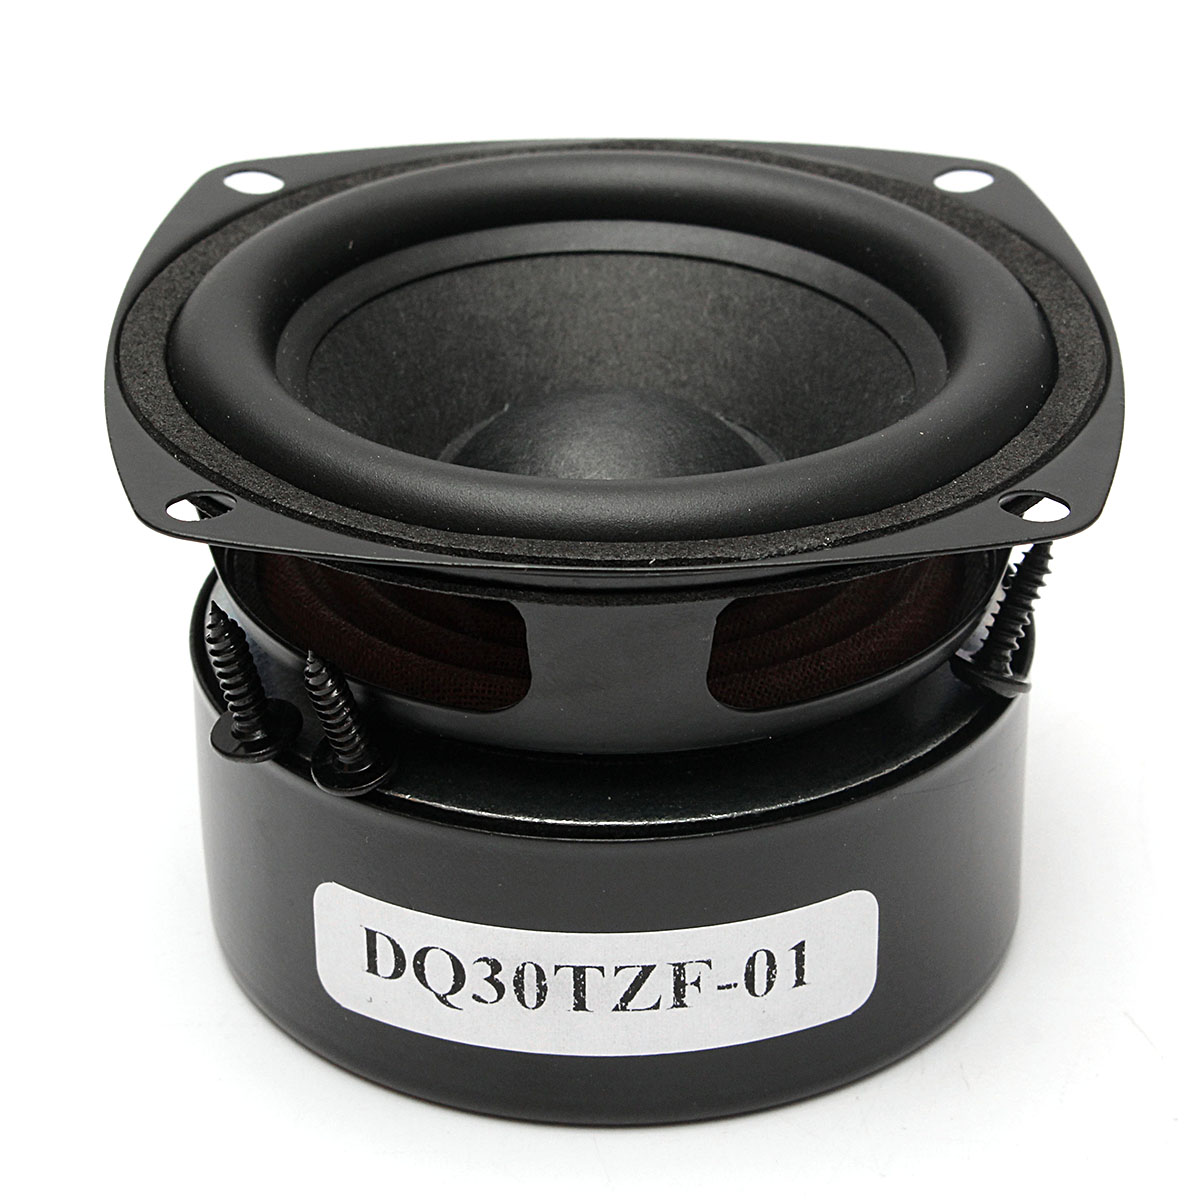 medium resolution of please confirm the size and the power before install the speakers to you car htb10jhnlvxxxxxnxxxxq6xxfxxxk htb1aknelvxxxxaaxpxxq6xxfxxx7